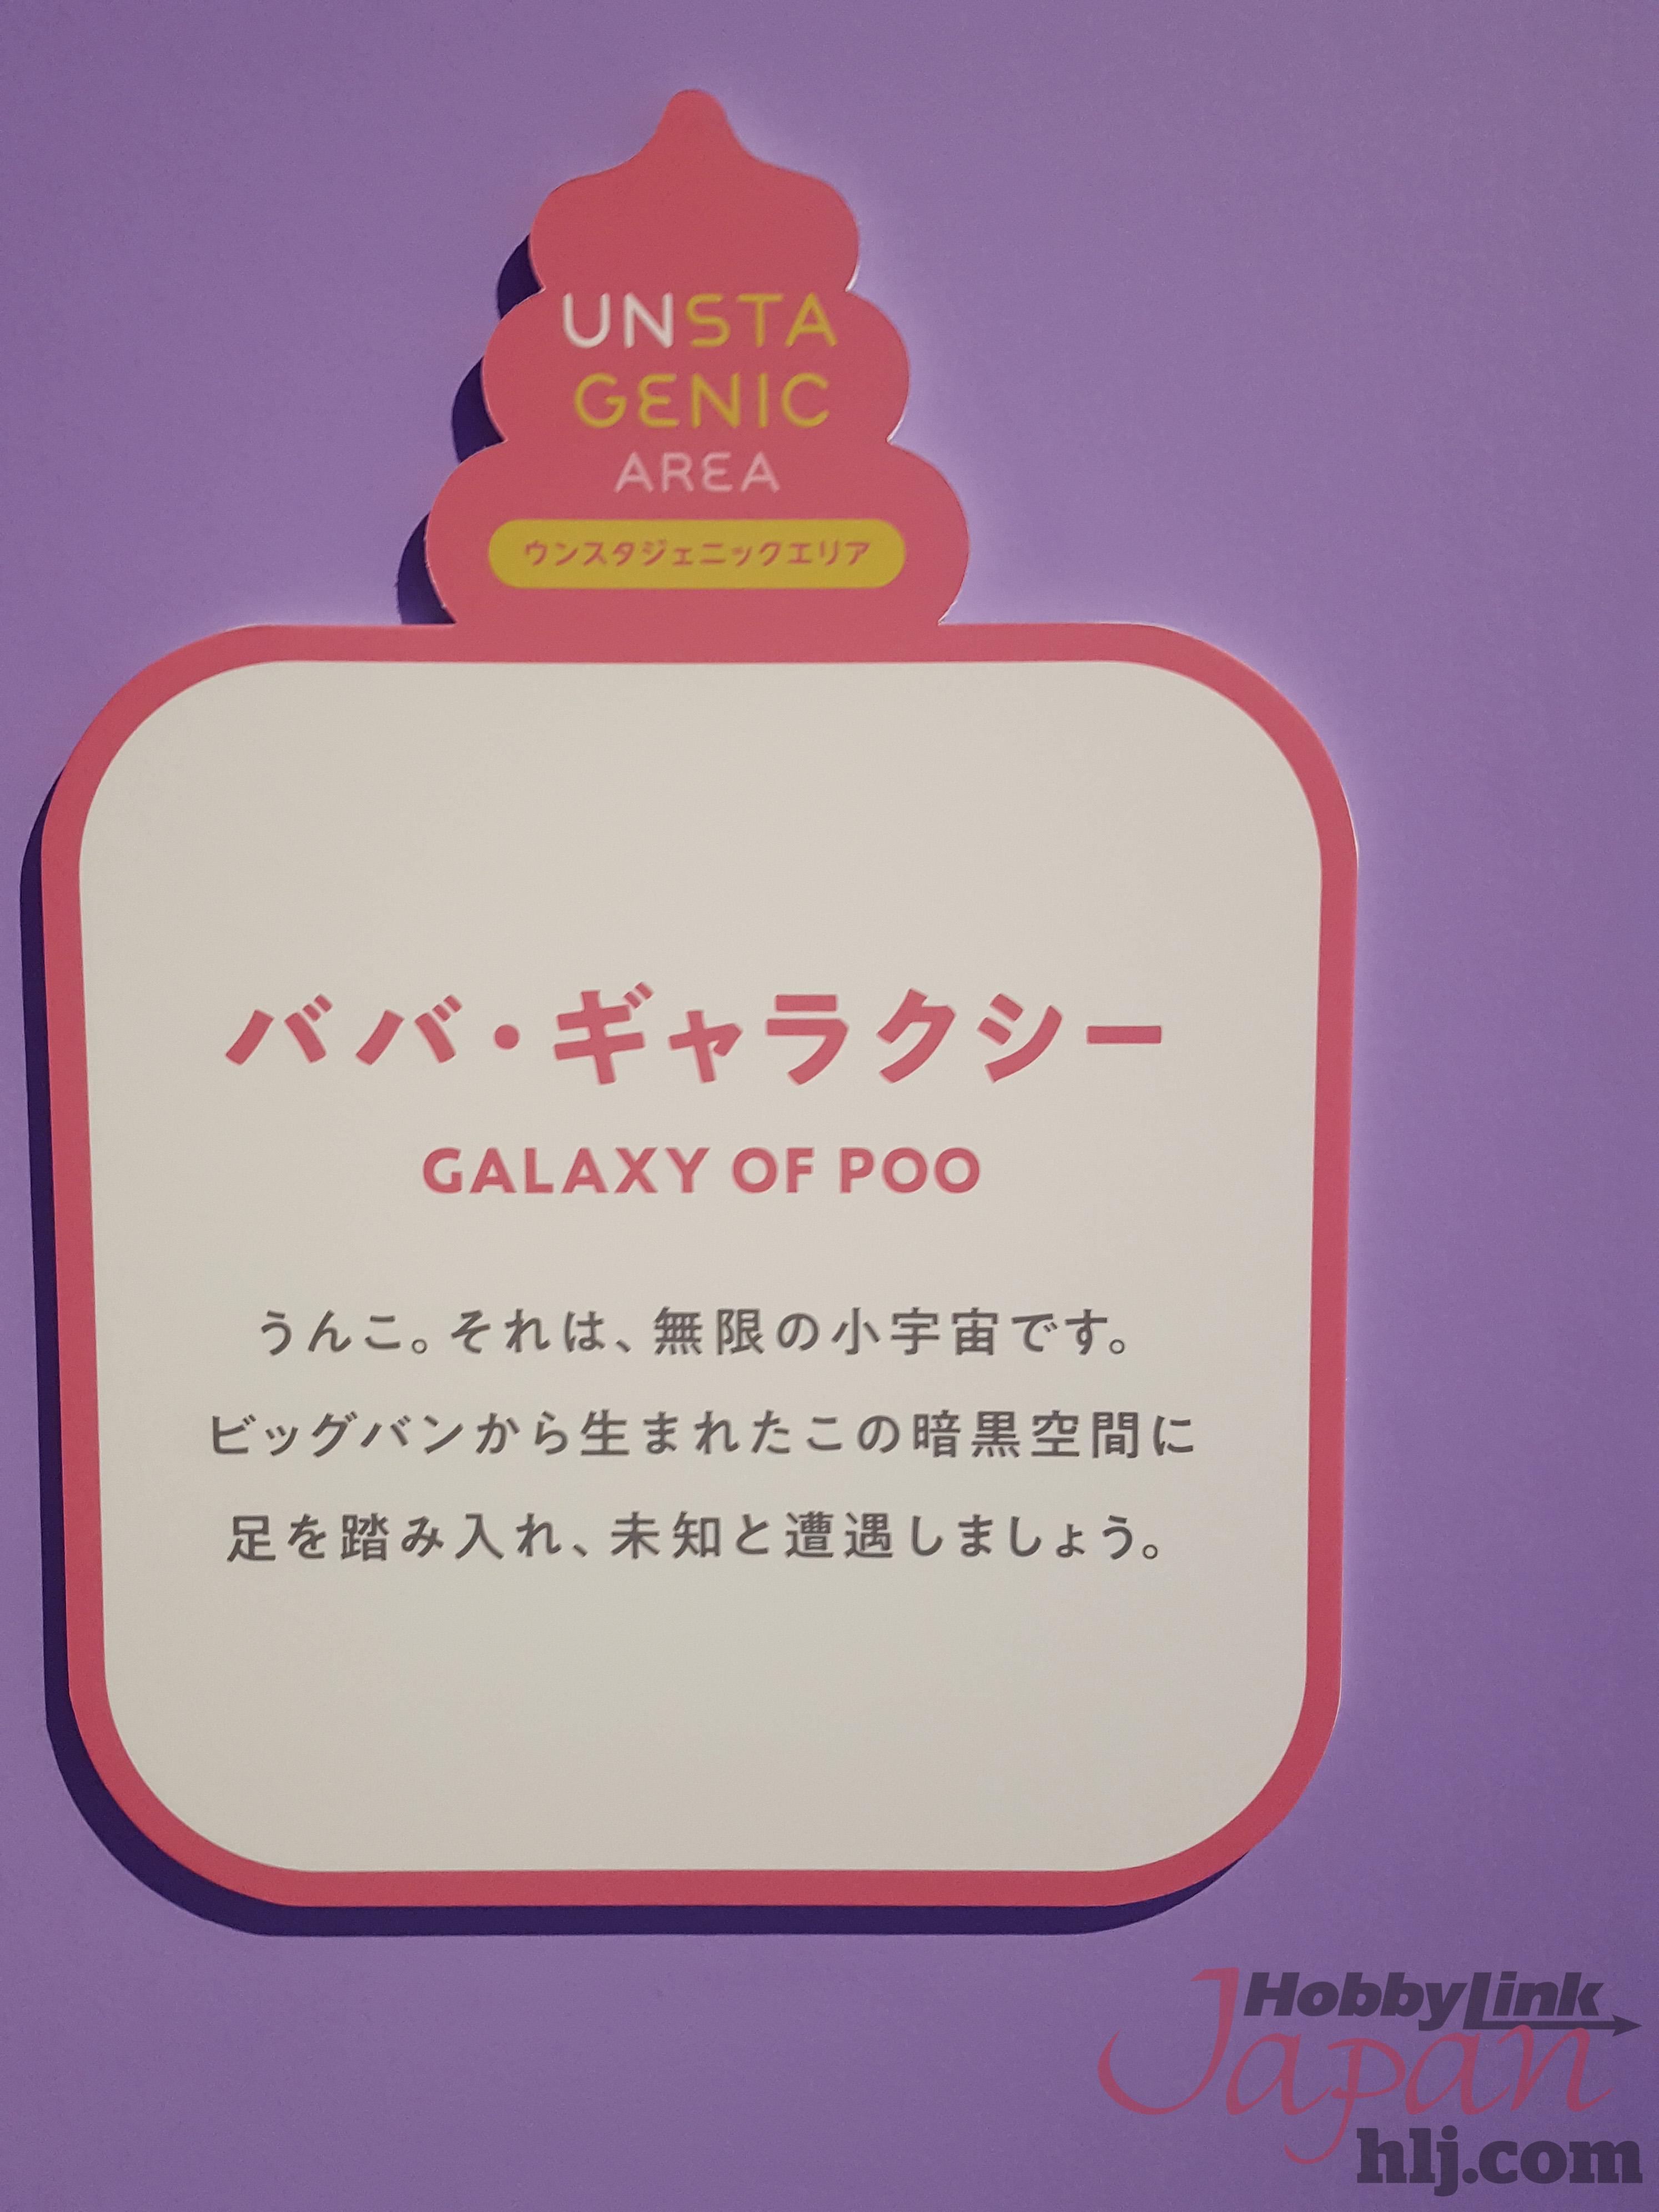 Unko Museum Galaxy of Poo